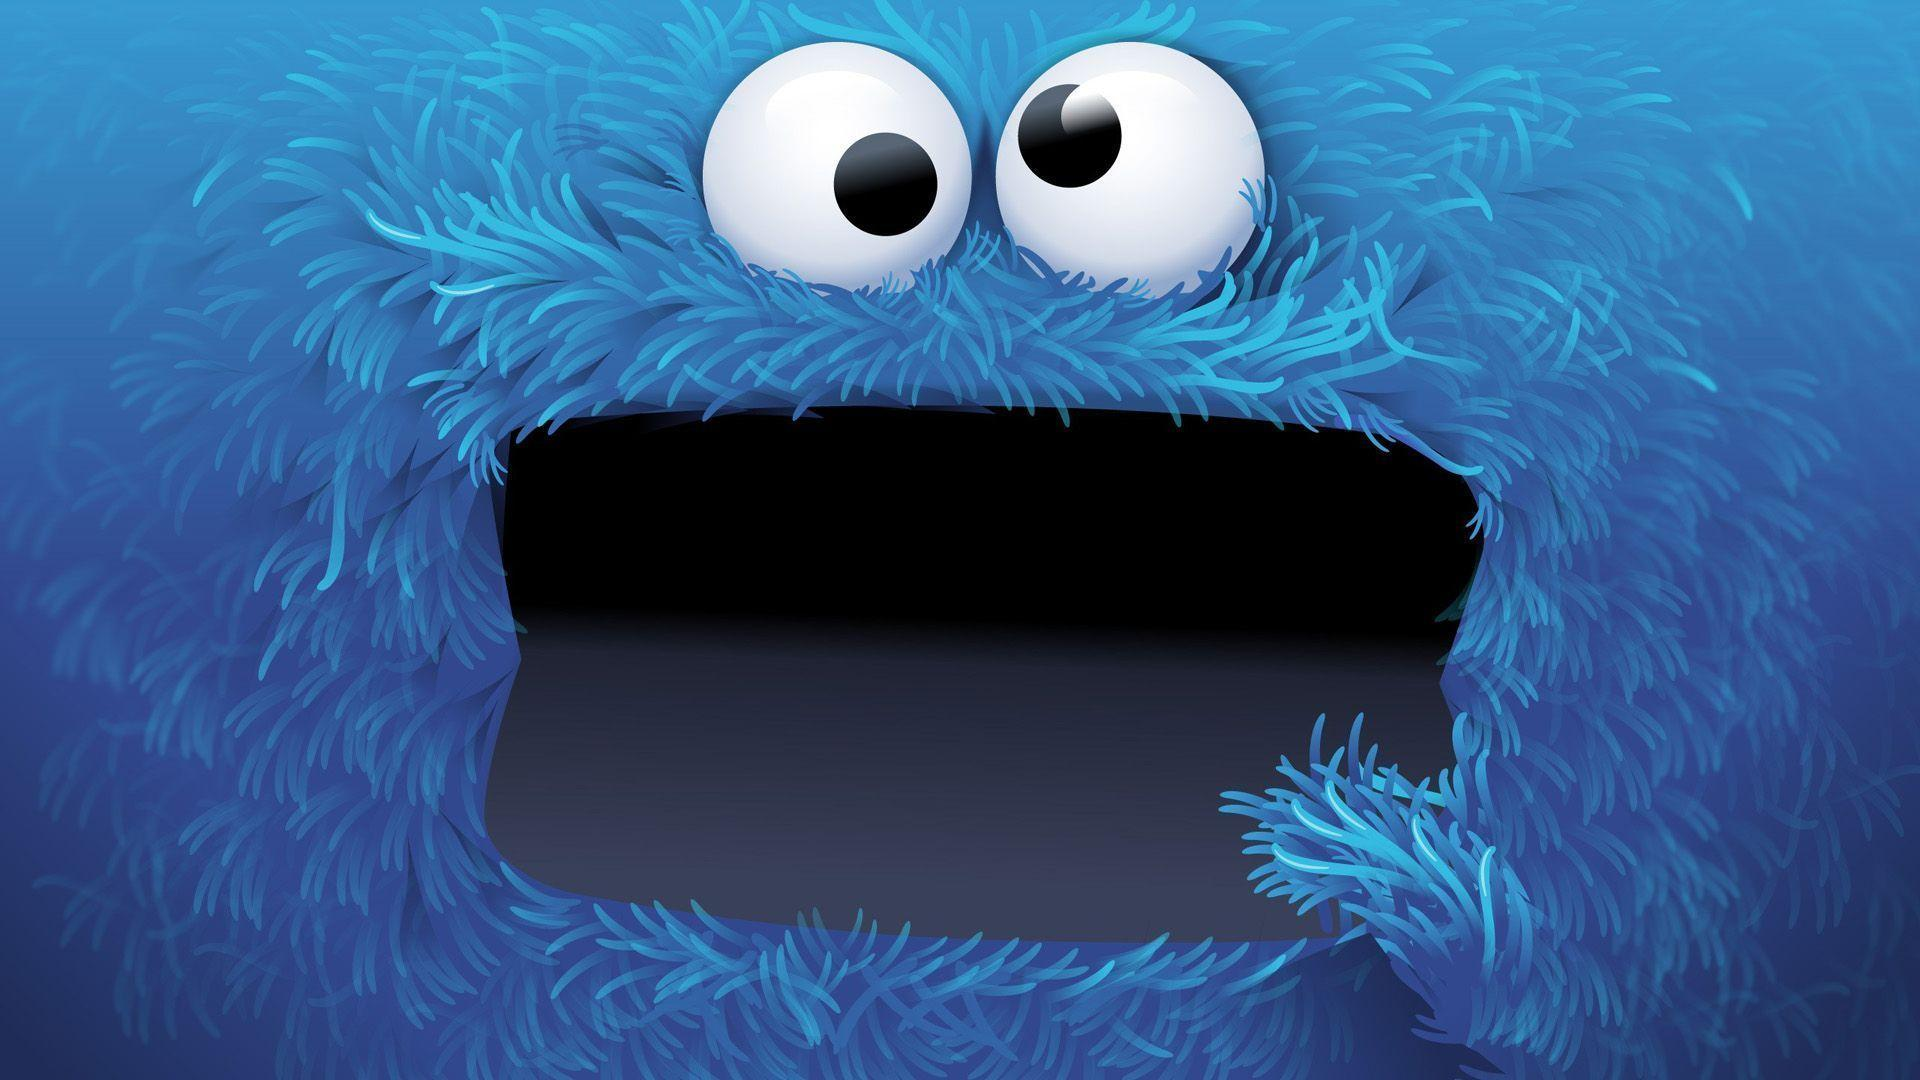 Cute Cookie Monster Wallpapers - Wallpaper Cave